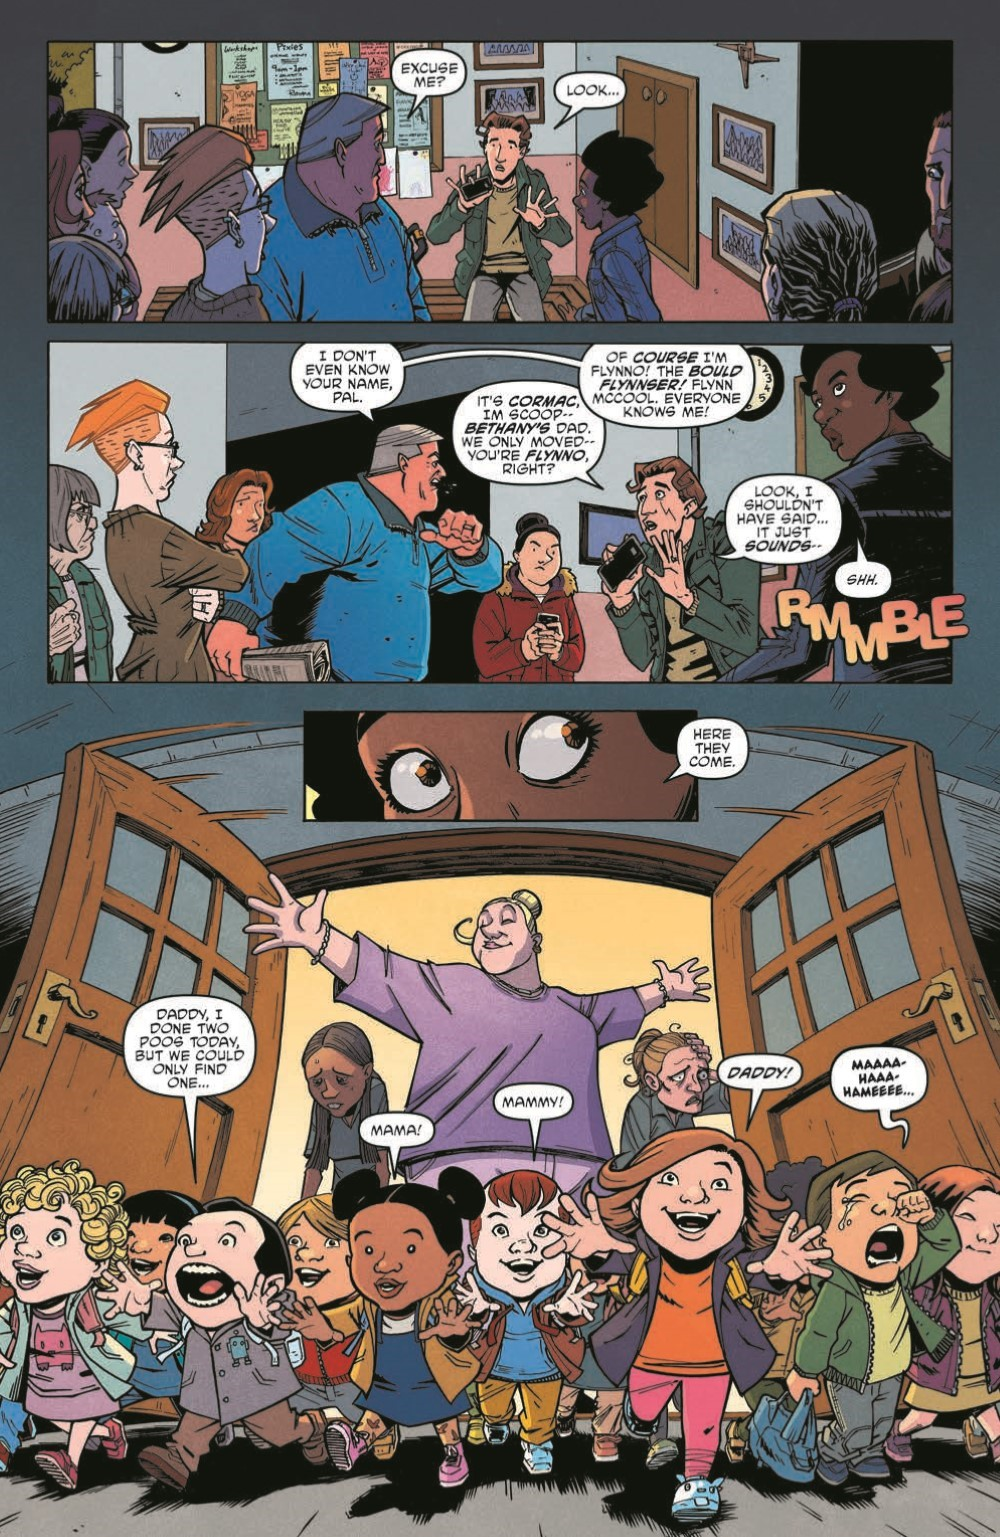 Scarenthood_pr-5 ComicList Previews: SCARENTHOOD TP